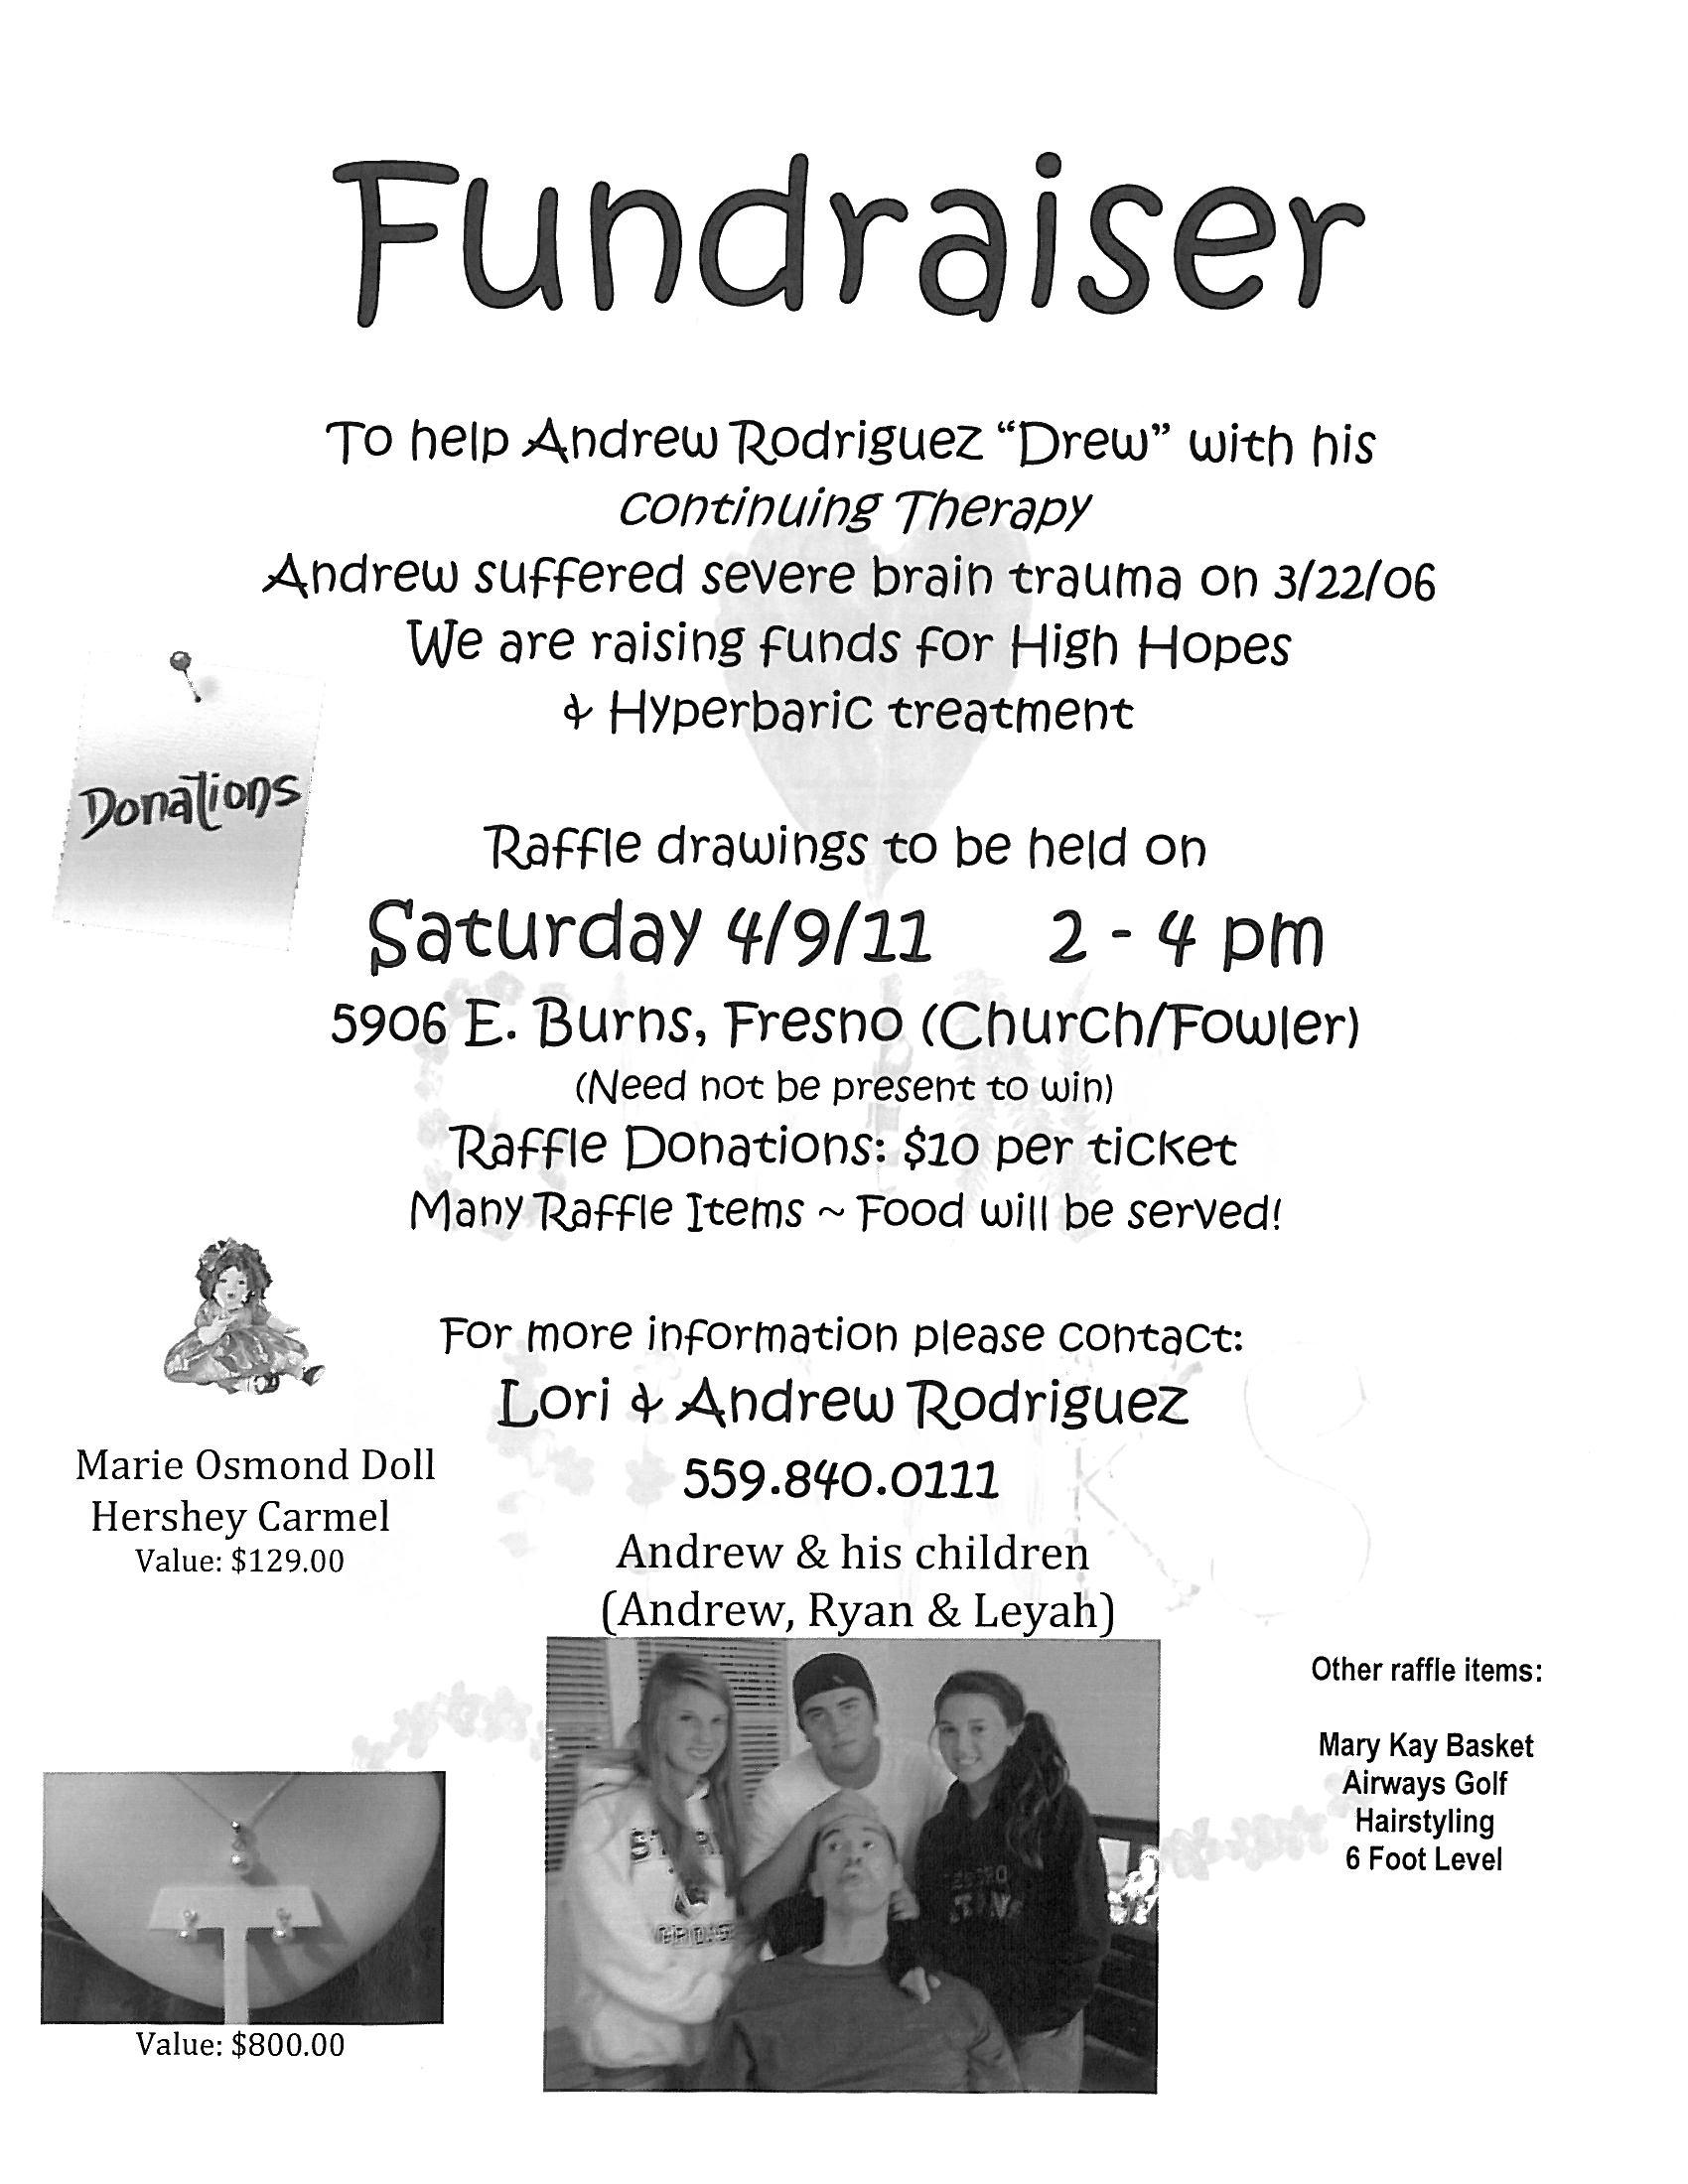 Fundraiser Invitations Templates